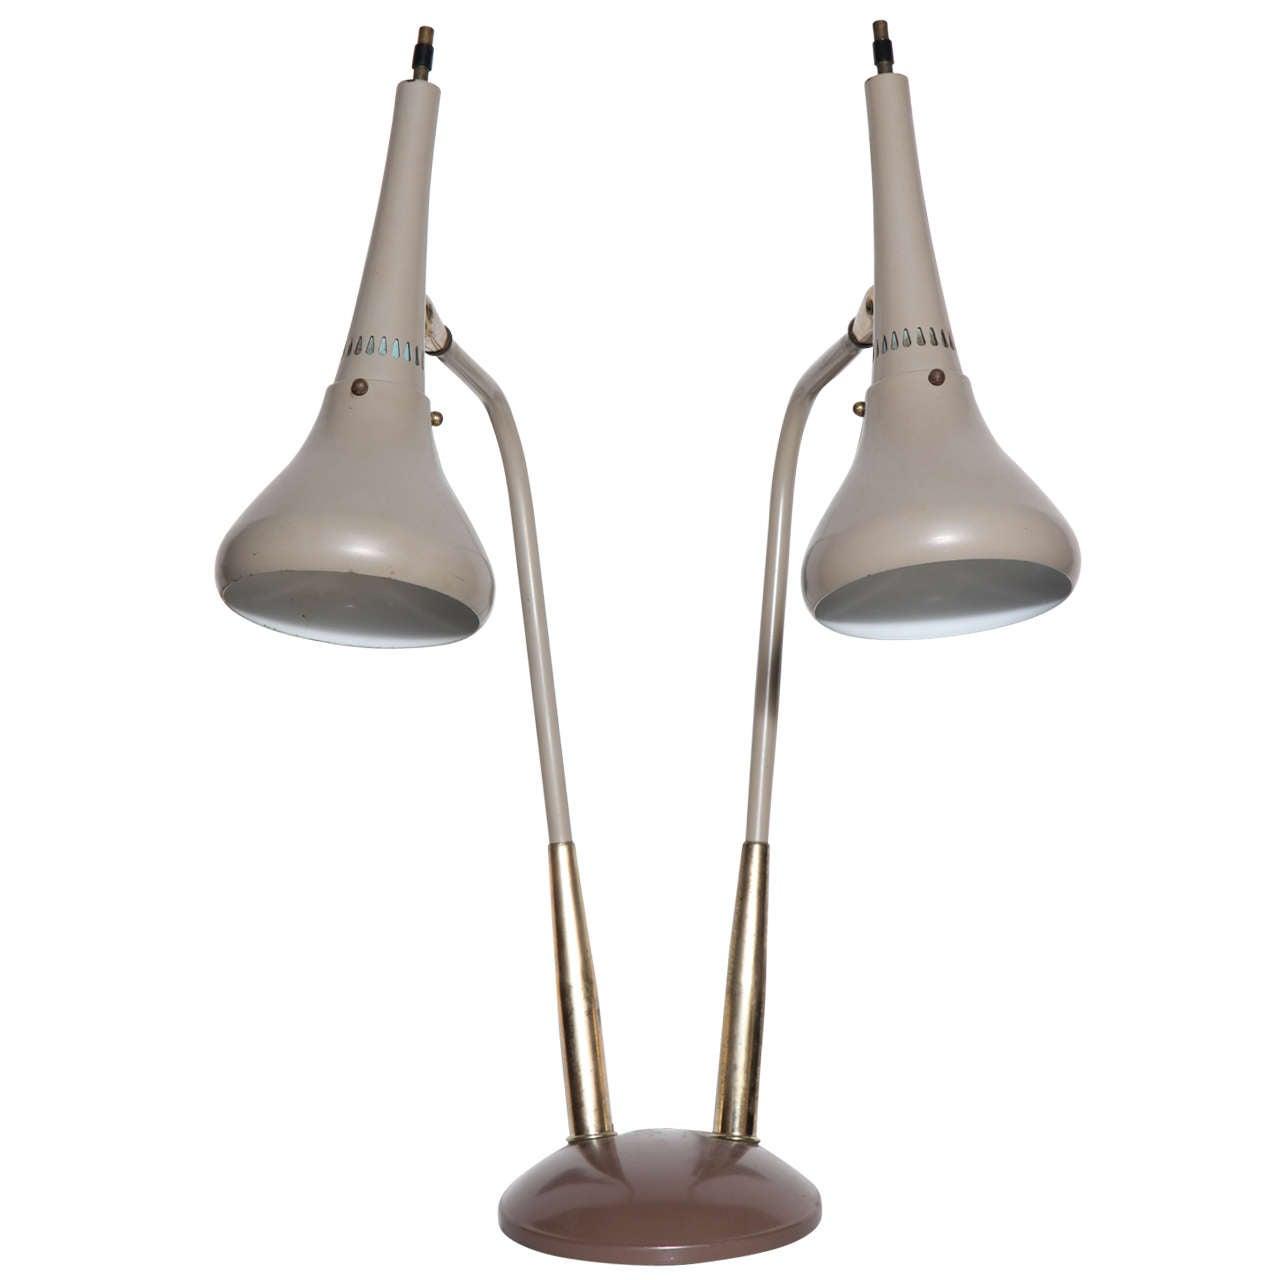 Rare gerald thurston double cone enamel and brass table lamp at rare gerald thurston double cone enamel brass table lamp 1 geotapseo Gallery